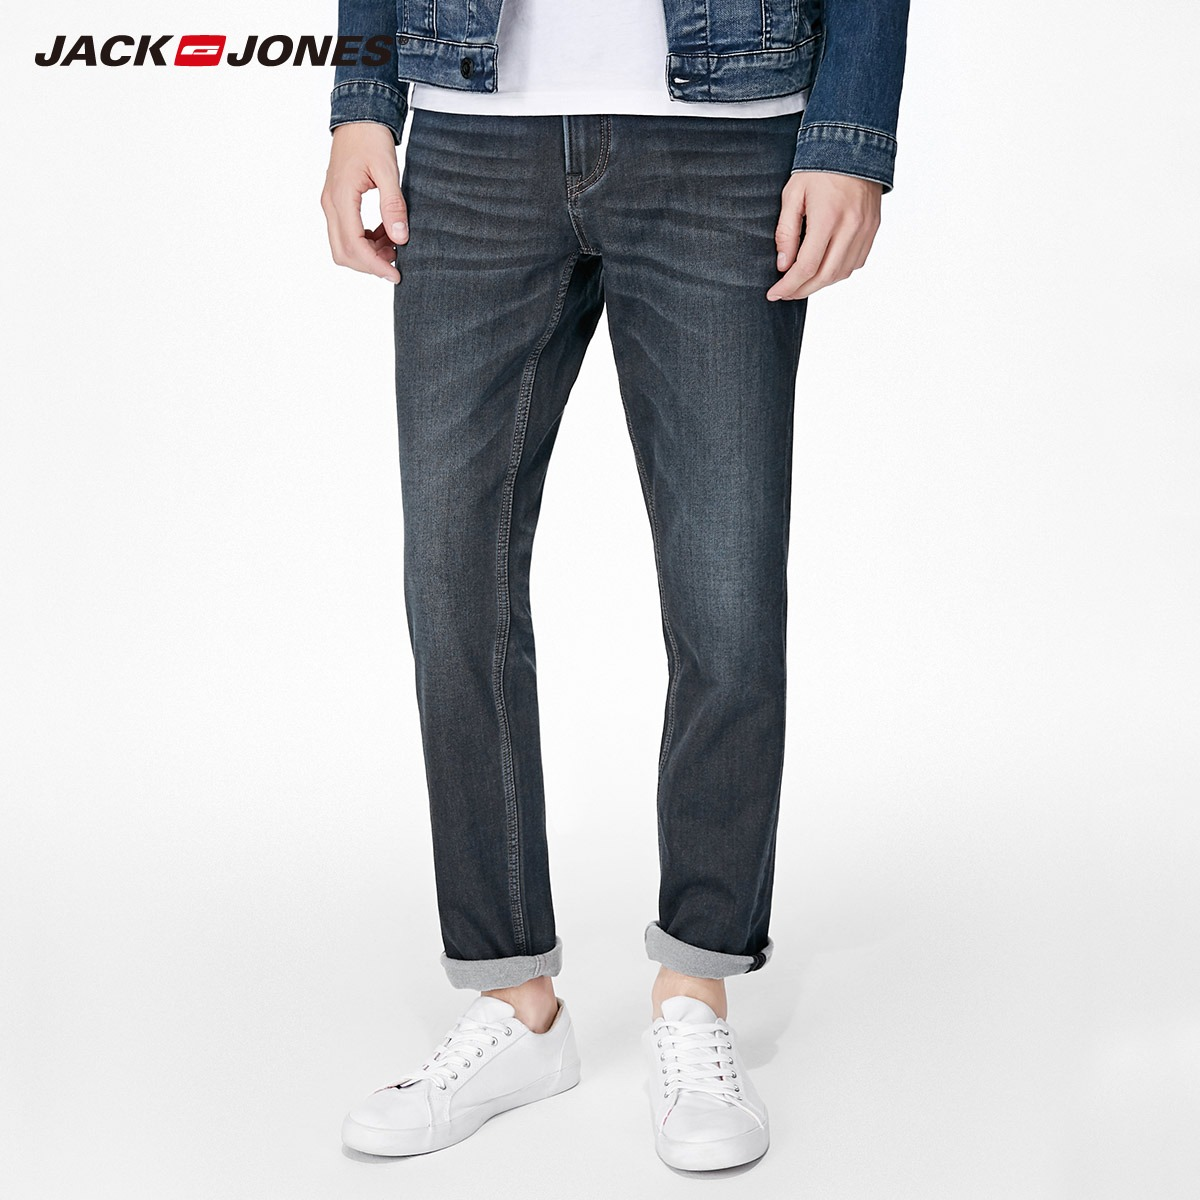 e906b1fb10a JackJones 2018 Brand New Men s Elastic Cotton Stretch Jeans Pants Slim Fit  Denim Trousers Men s Biker